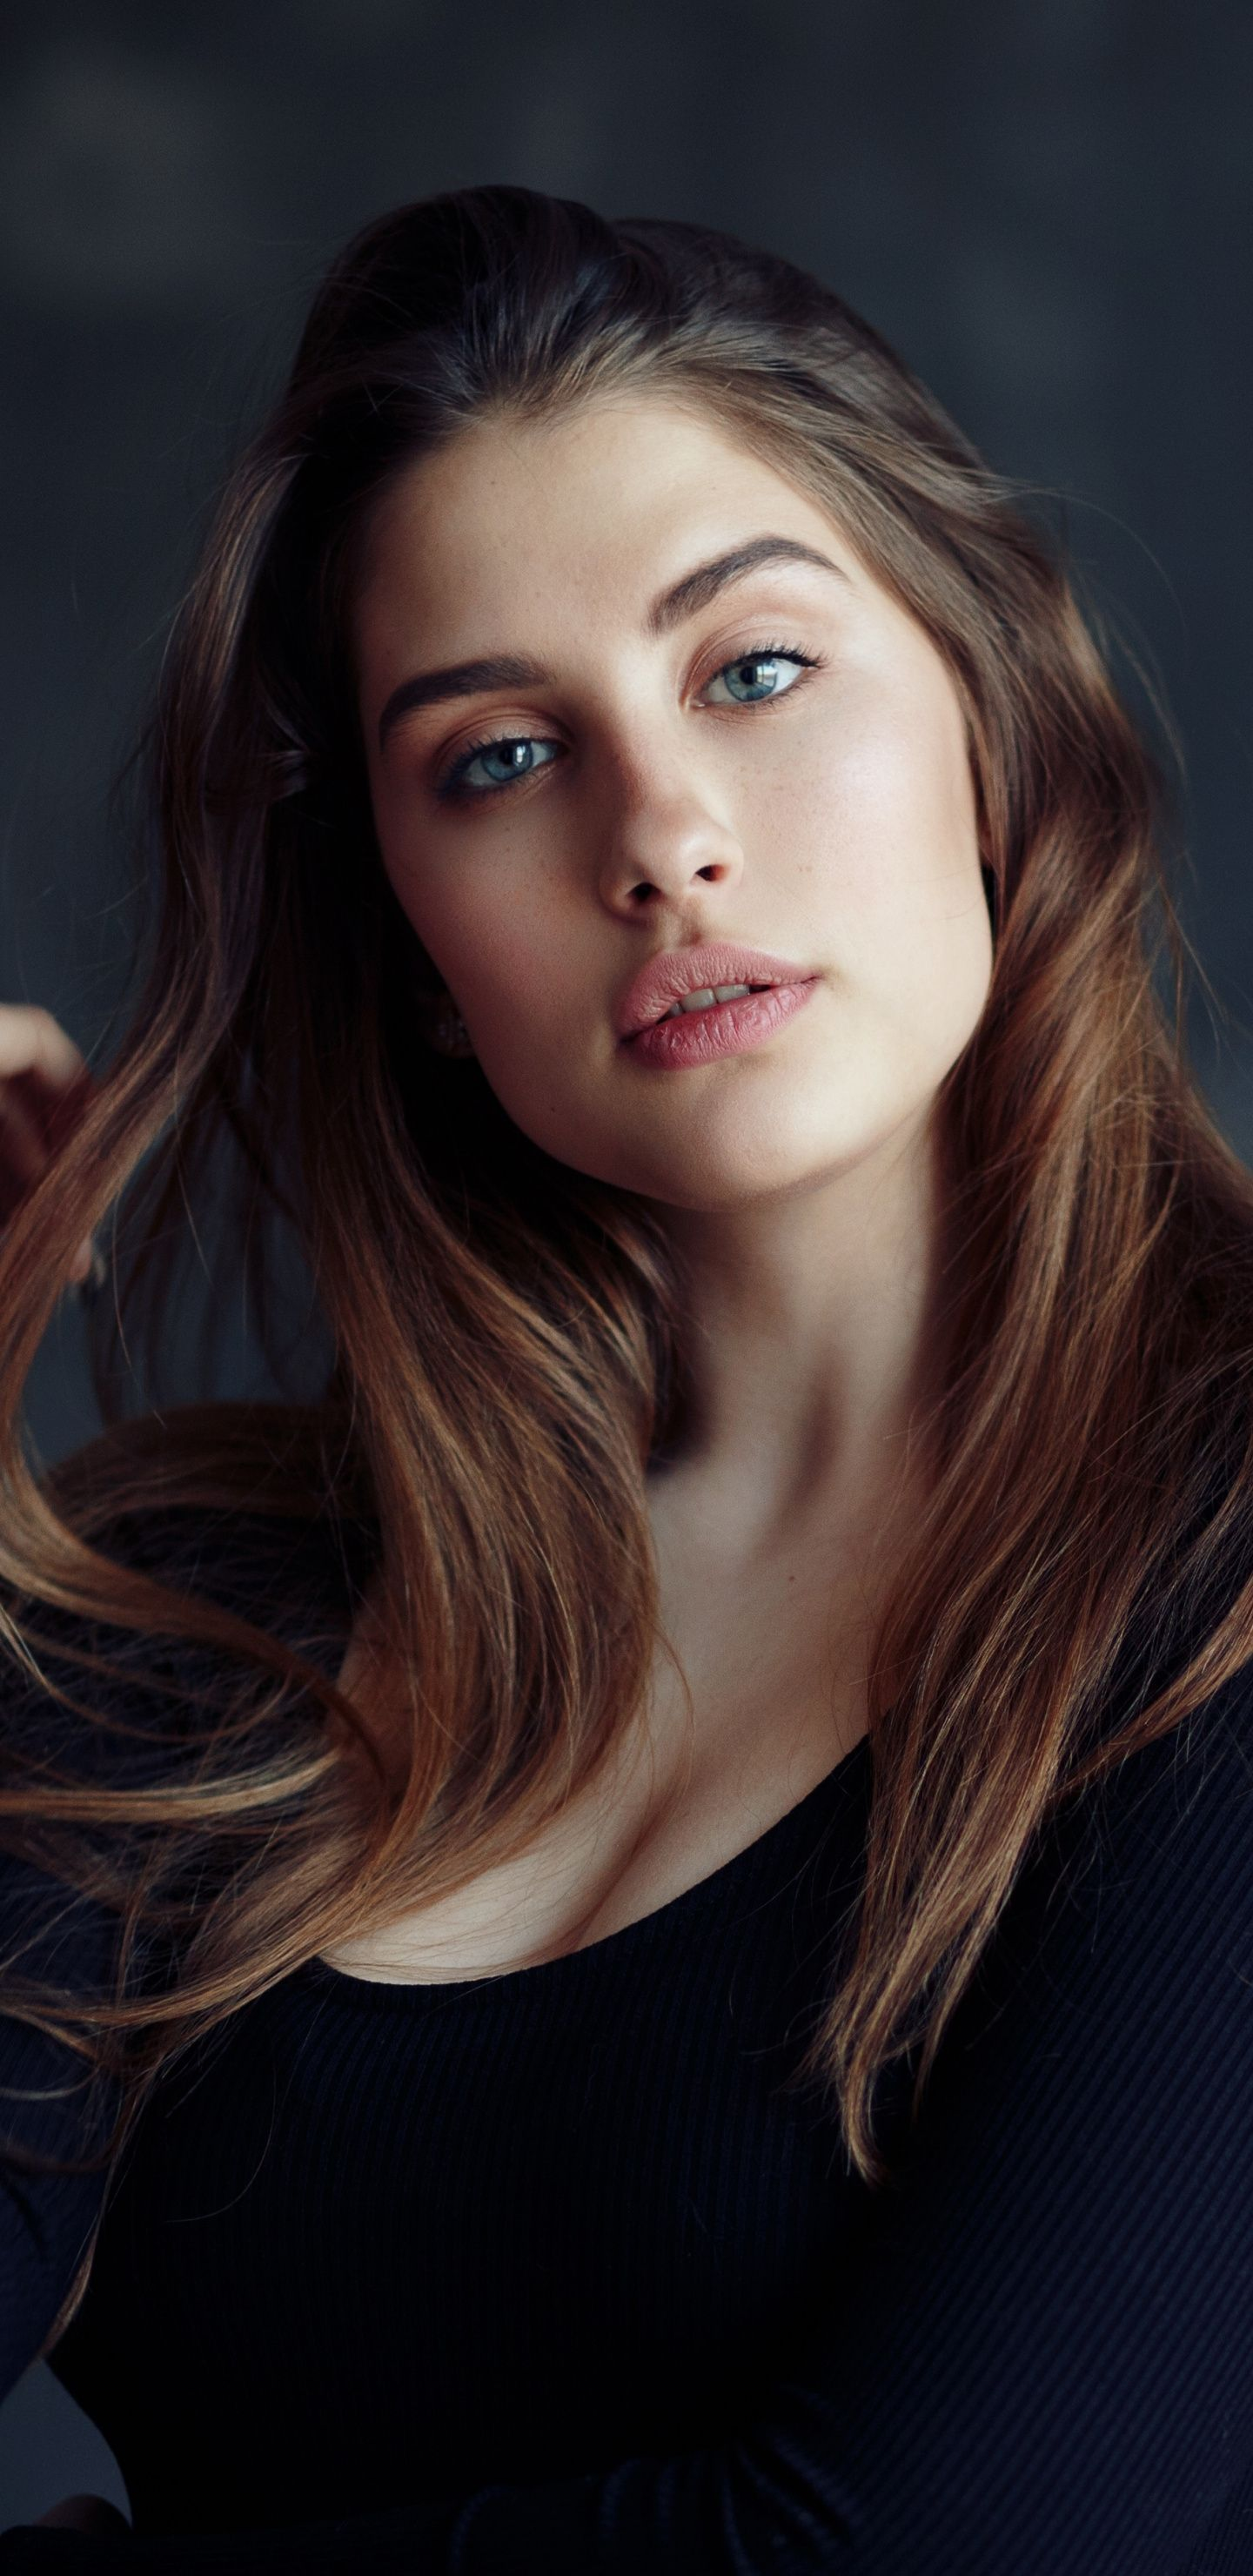 1440x2960 Hot And Brunette Girl Model Beautiful Wallpaper Girl Model Model Photos Beautiful Girl Wallpaper